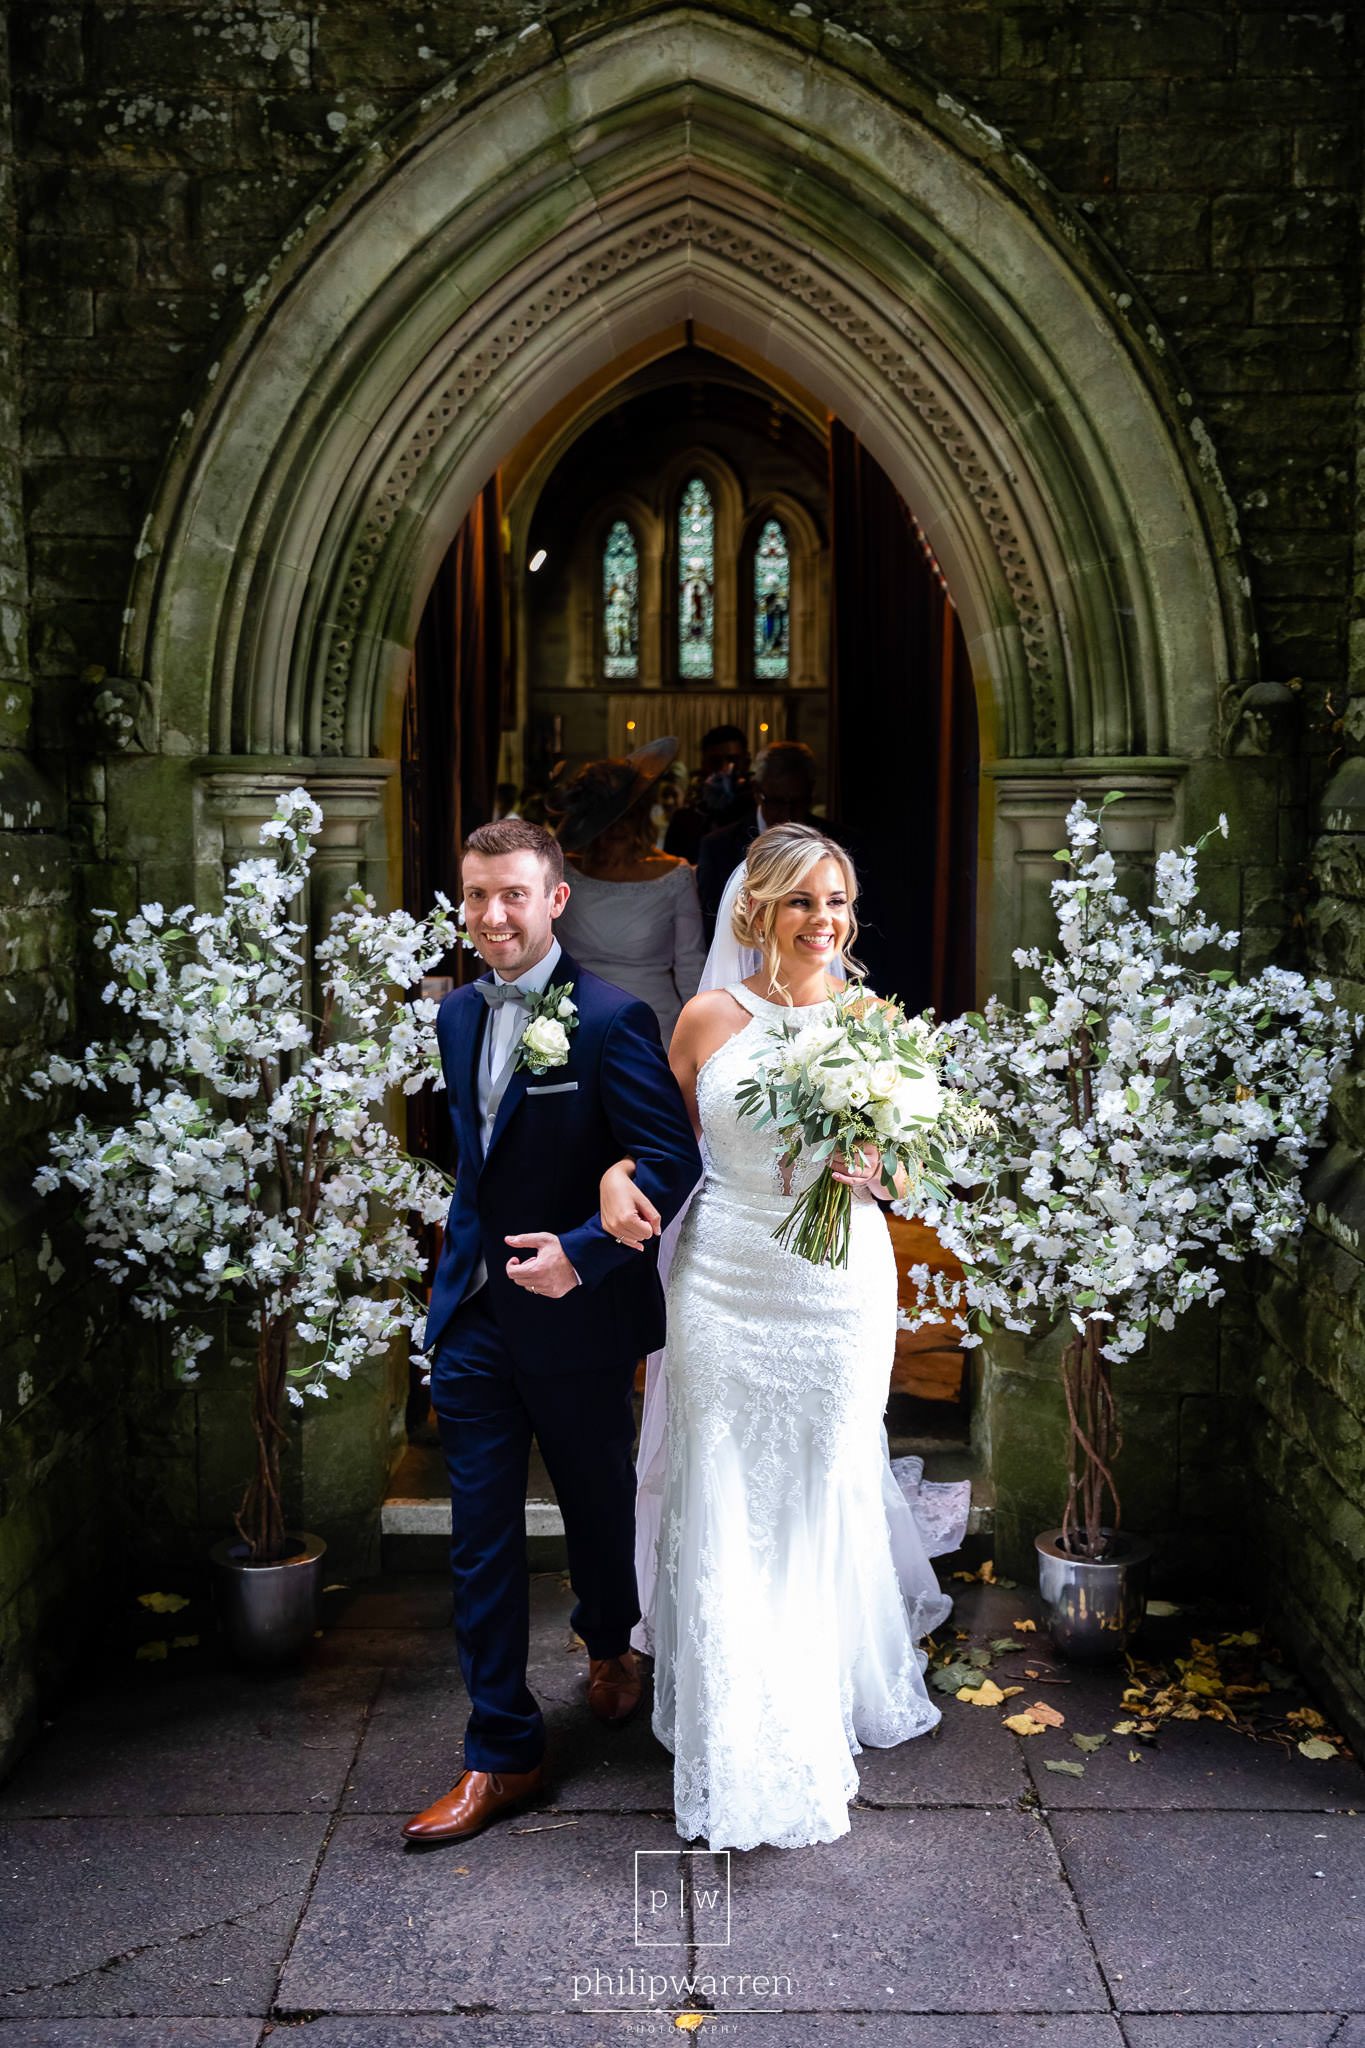 wedding photos at llanerch vineyard rachel + craig-7.jpg